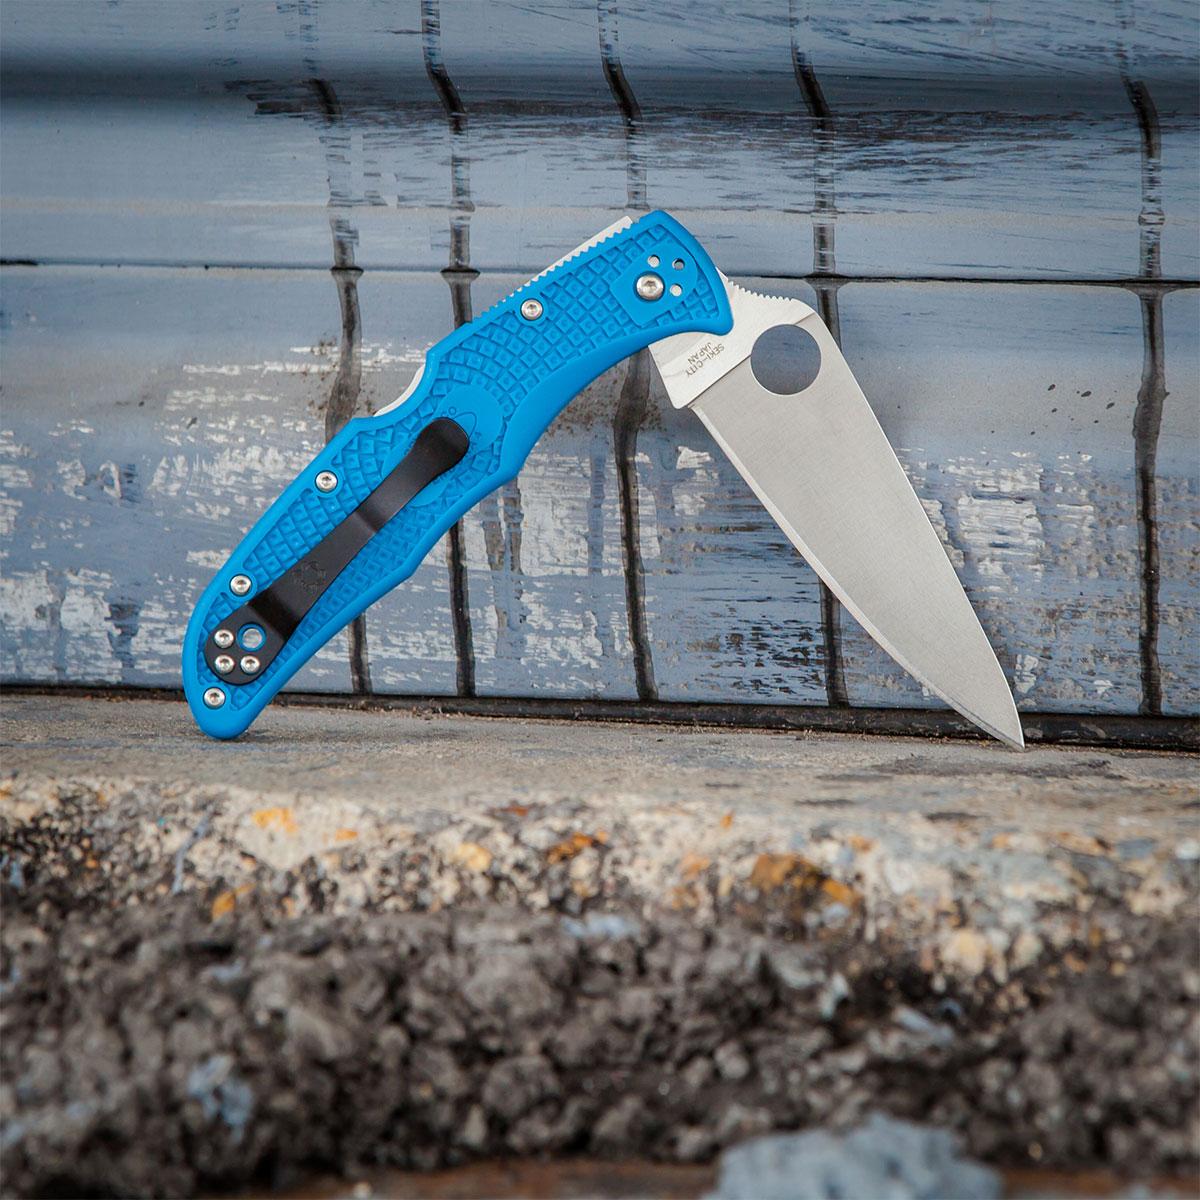 10 Best Spyderco Knives | Knife Depot